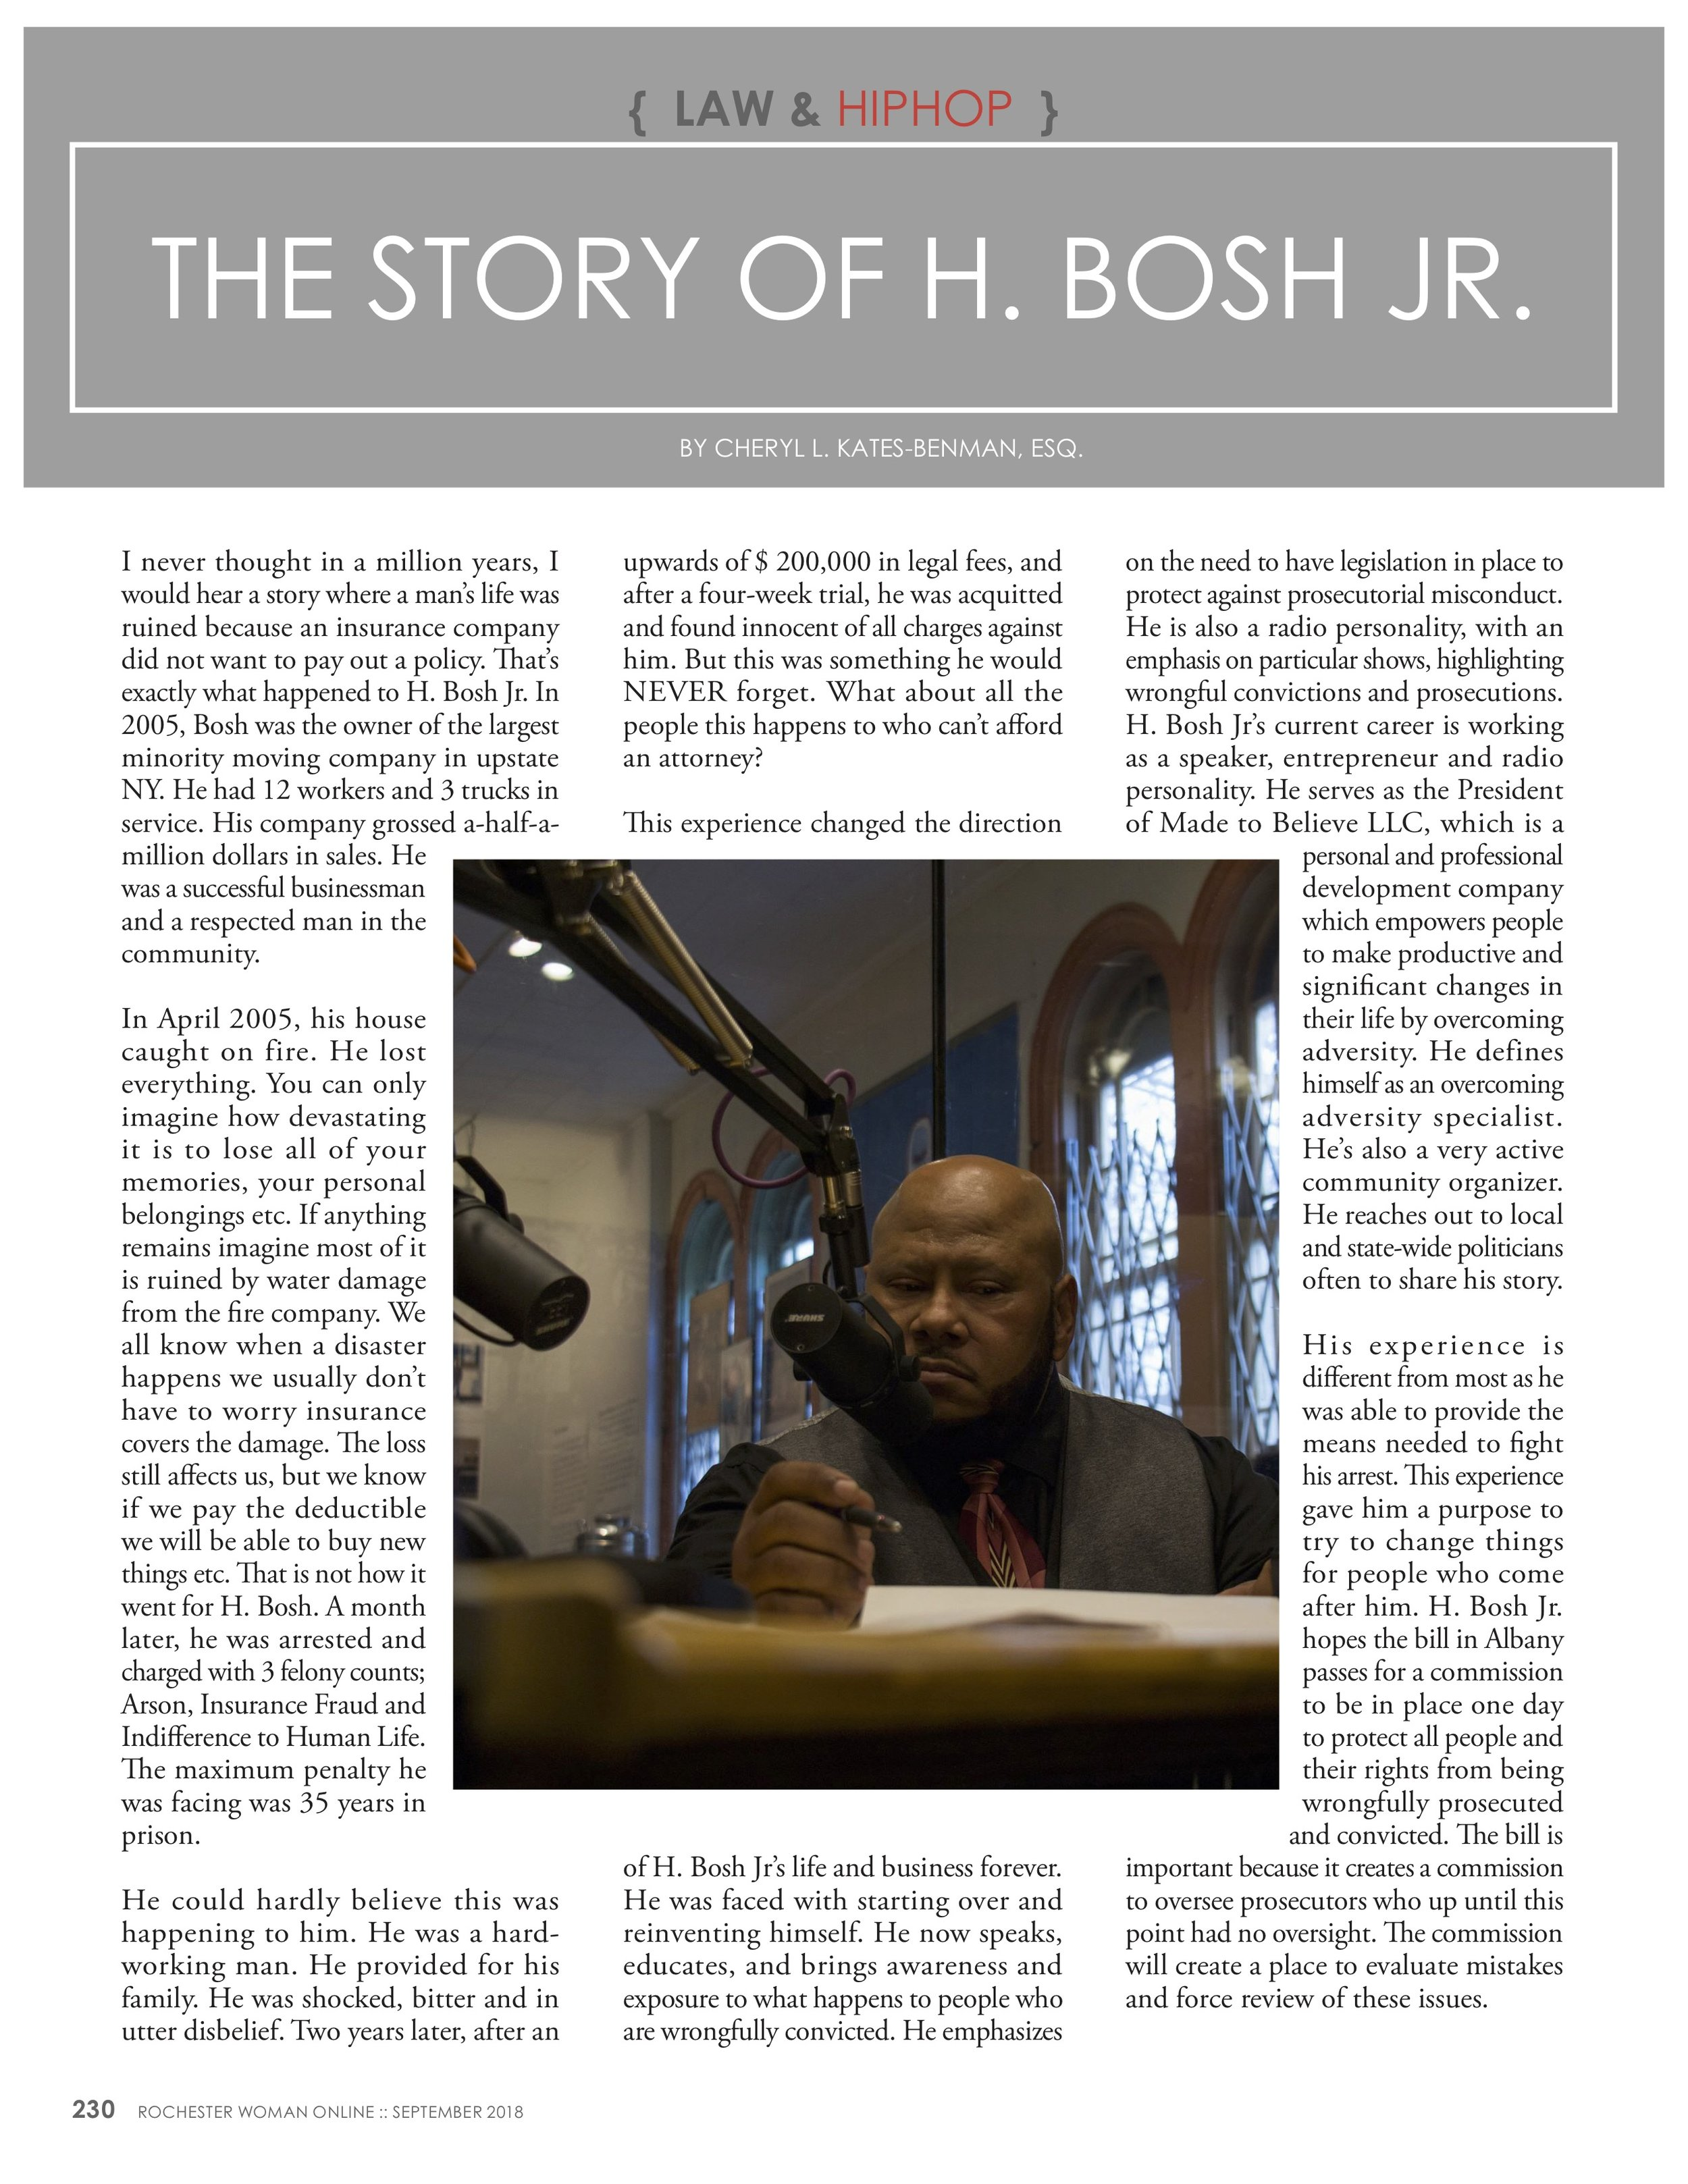 The Story of H Bosh Jr.jpg